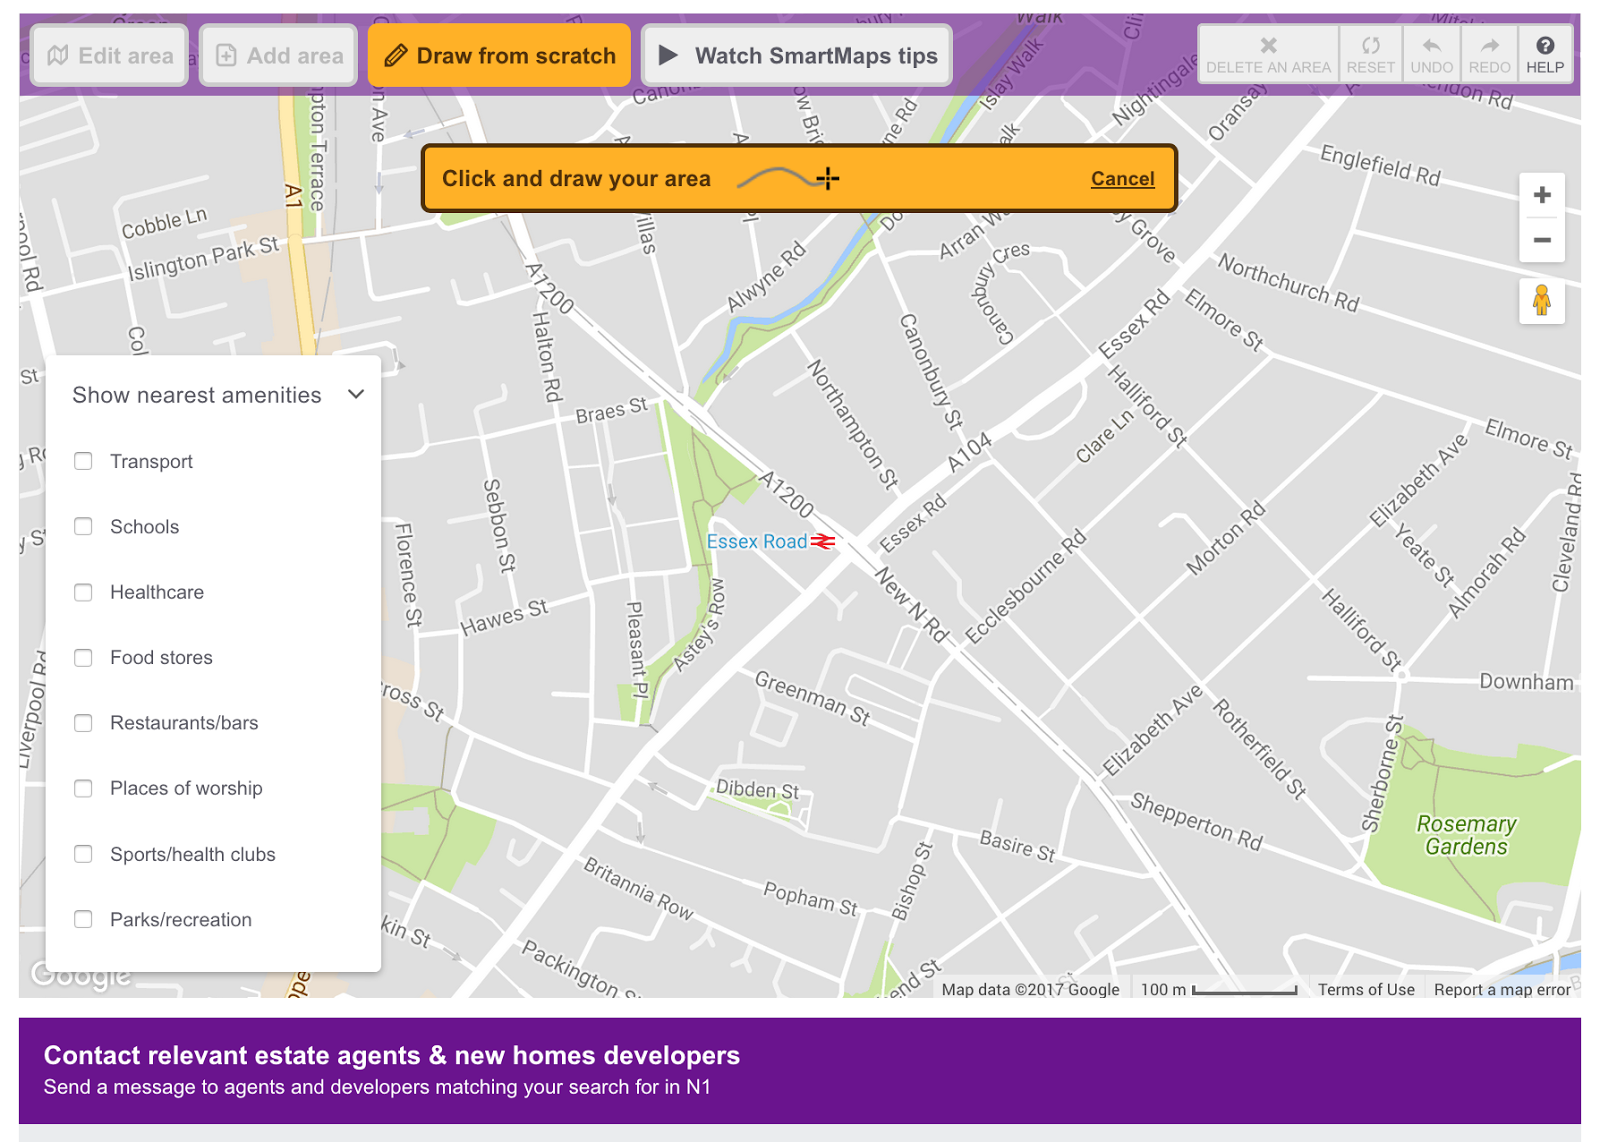 screenshot of Zoopla's SmartMaps feature